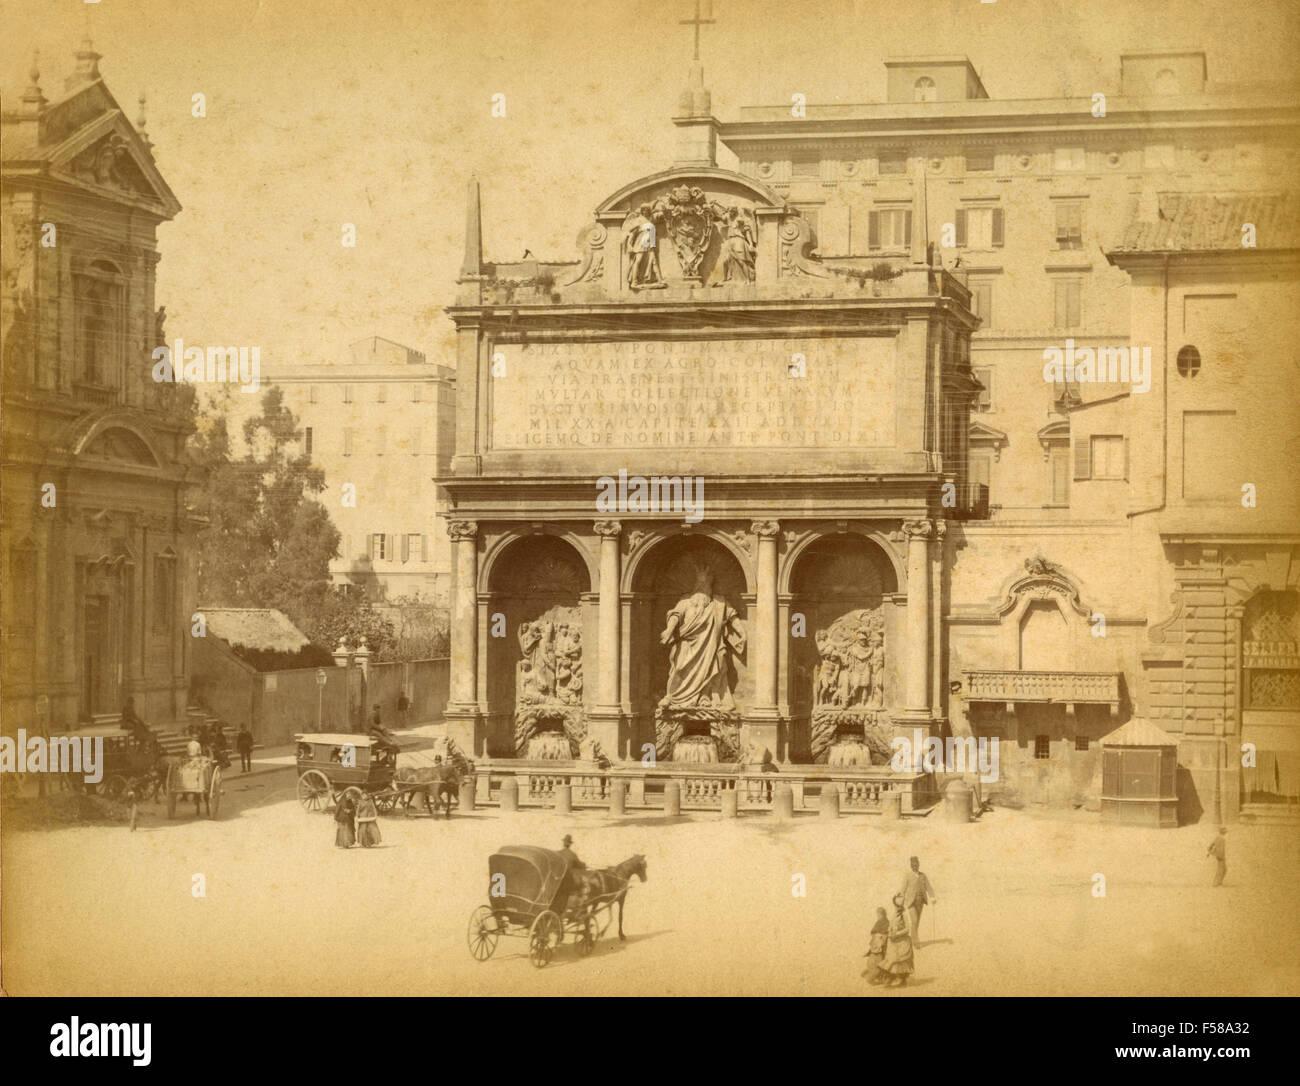 The Fountain of the Acqua Felice, Largo Santa Susanna, Rome, Italy - Stock Image